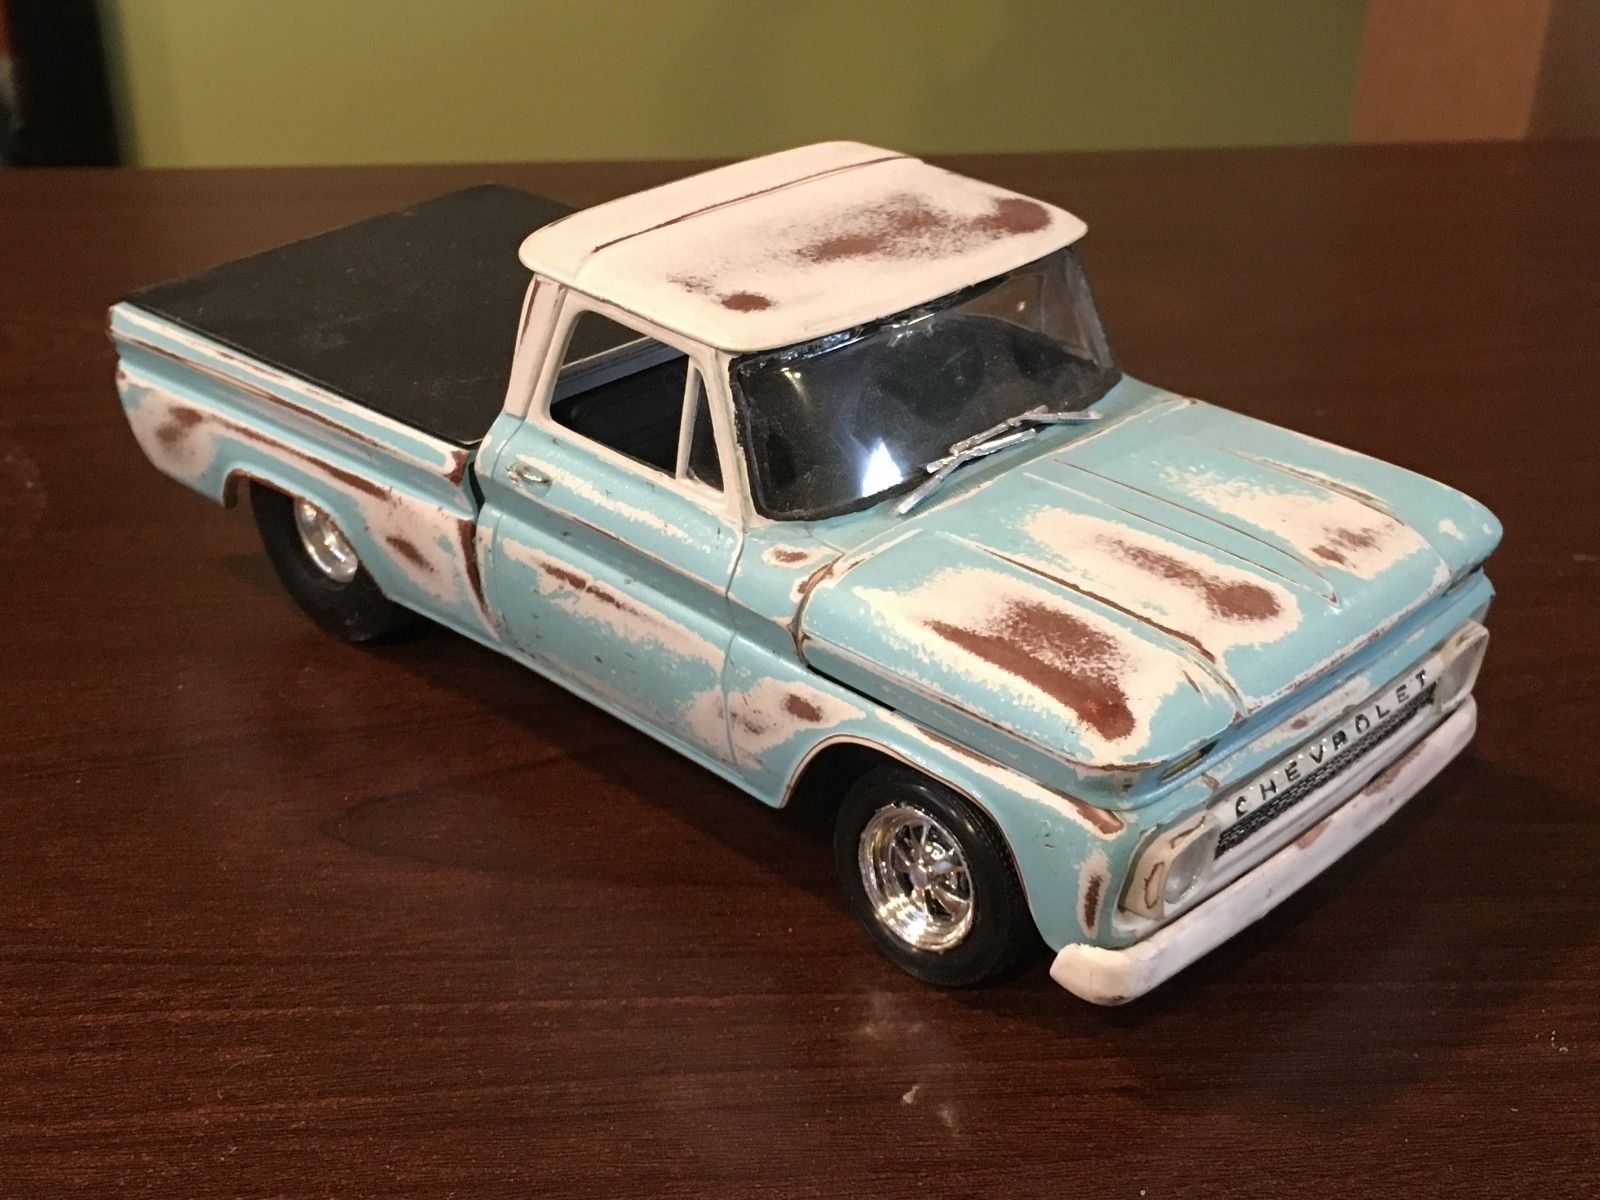 1964 Chevy Fleetside Pickup Truck Car Model Kit Rat Rod Wreck Junkyard Ebay